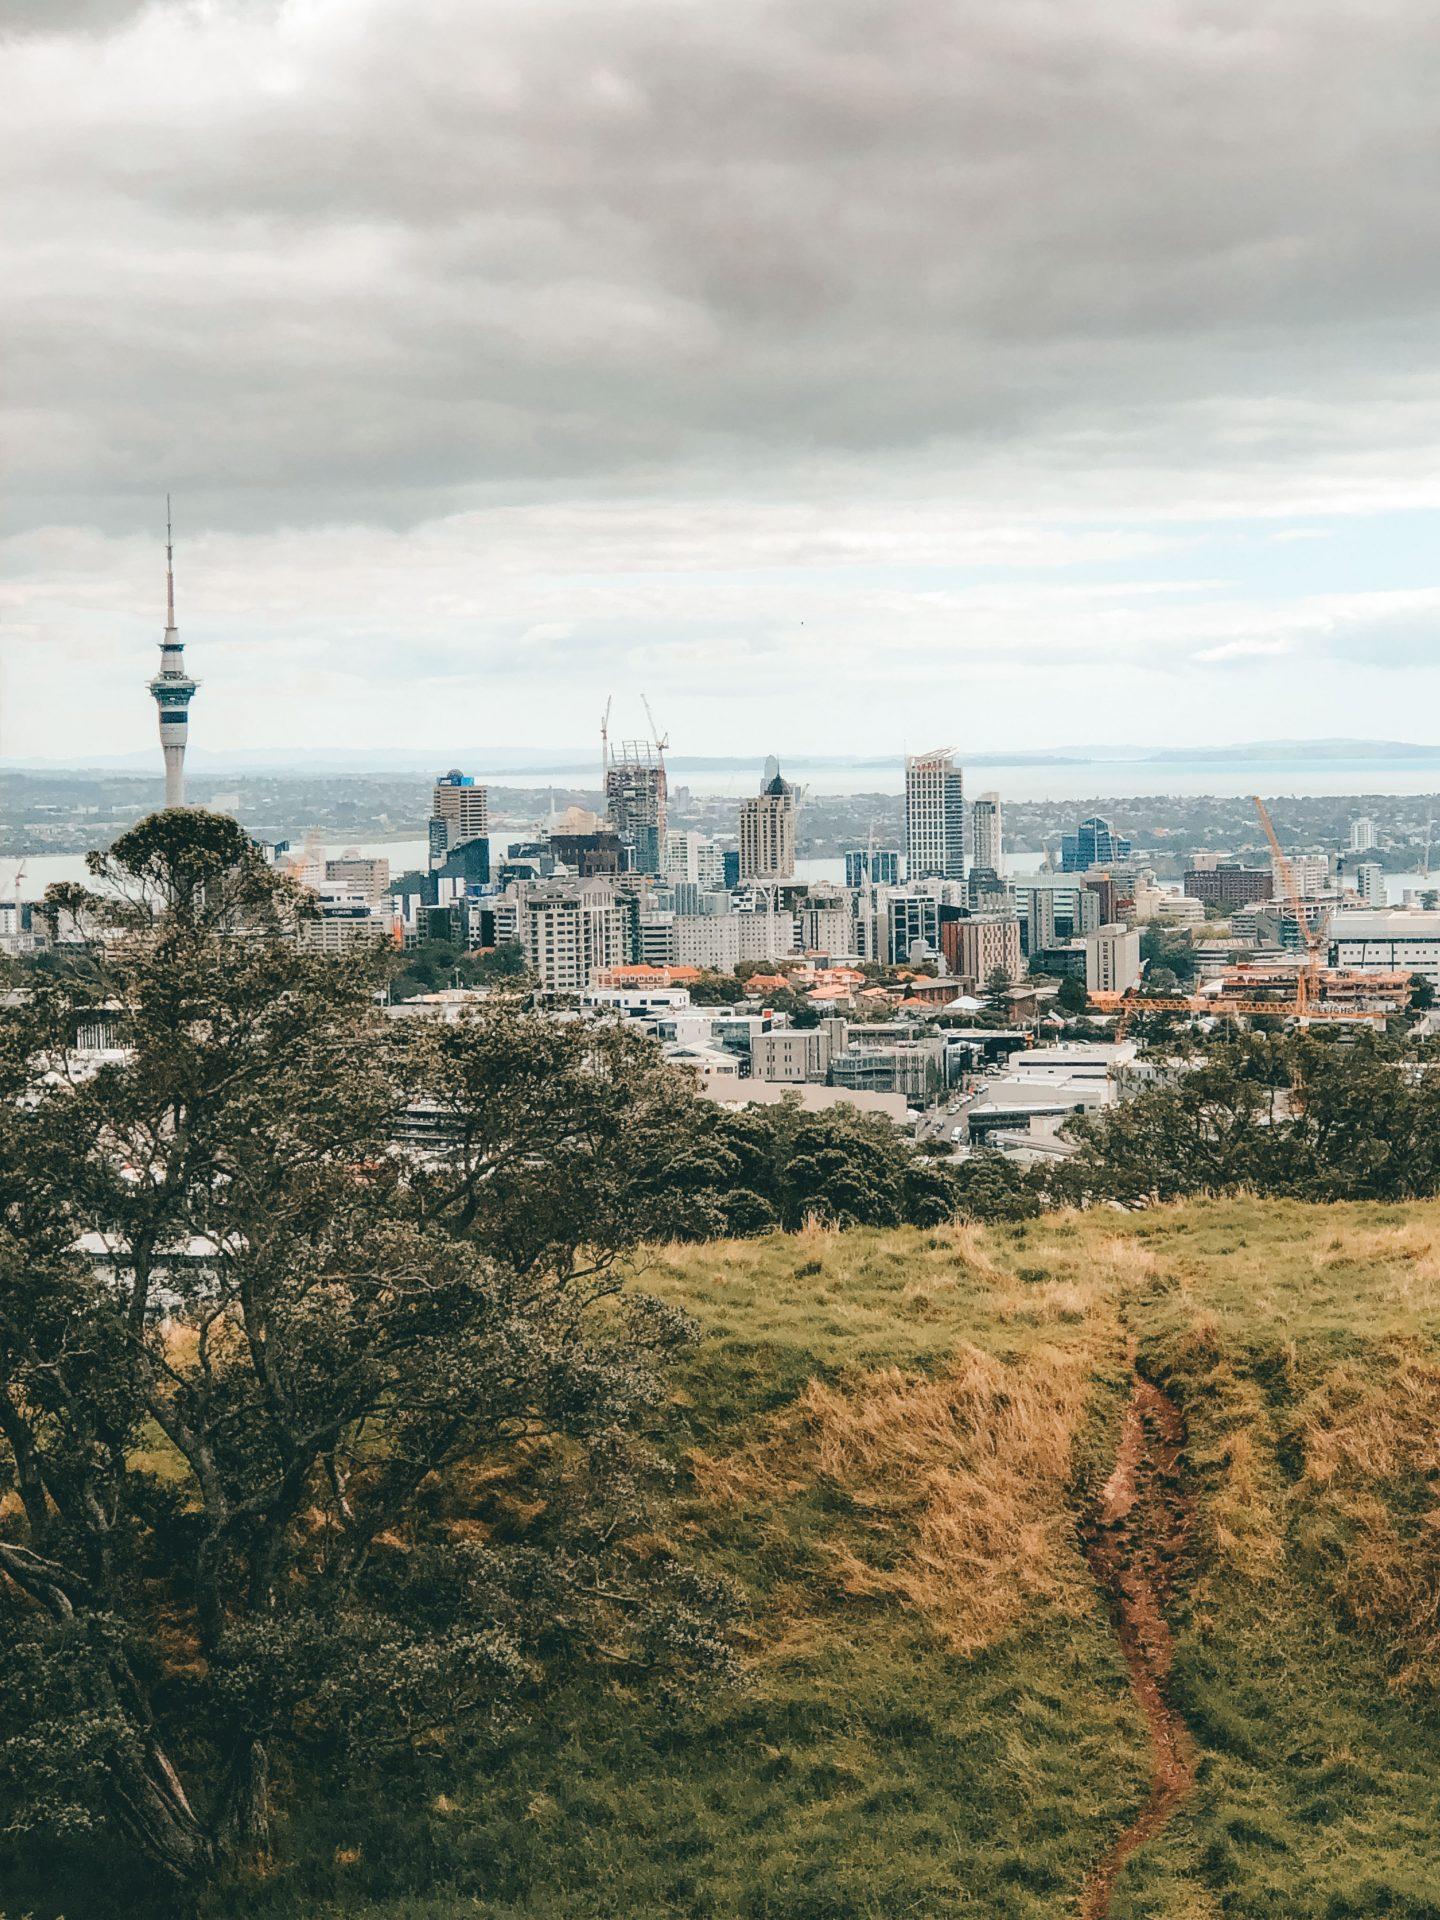 Visiter Auckland Nouvelle-Zélande - Blondie Baby blog voyages et mode